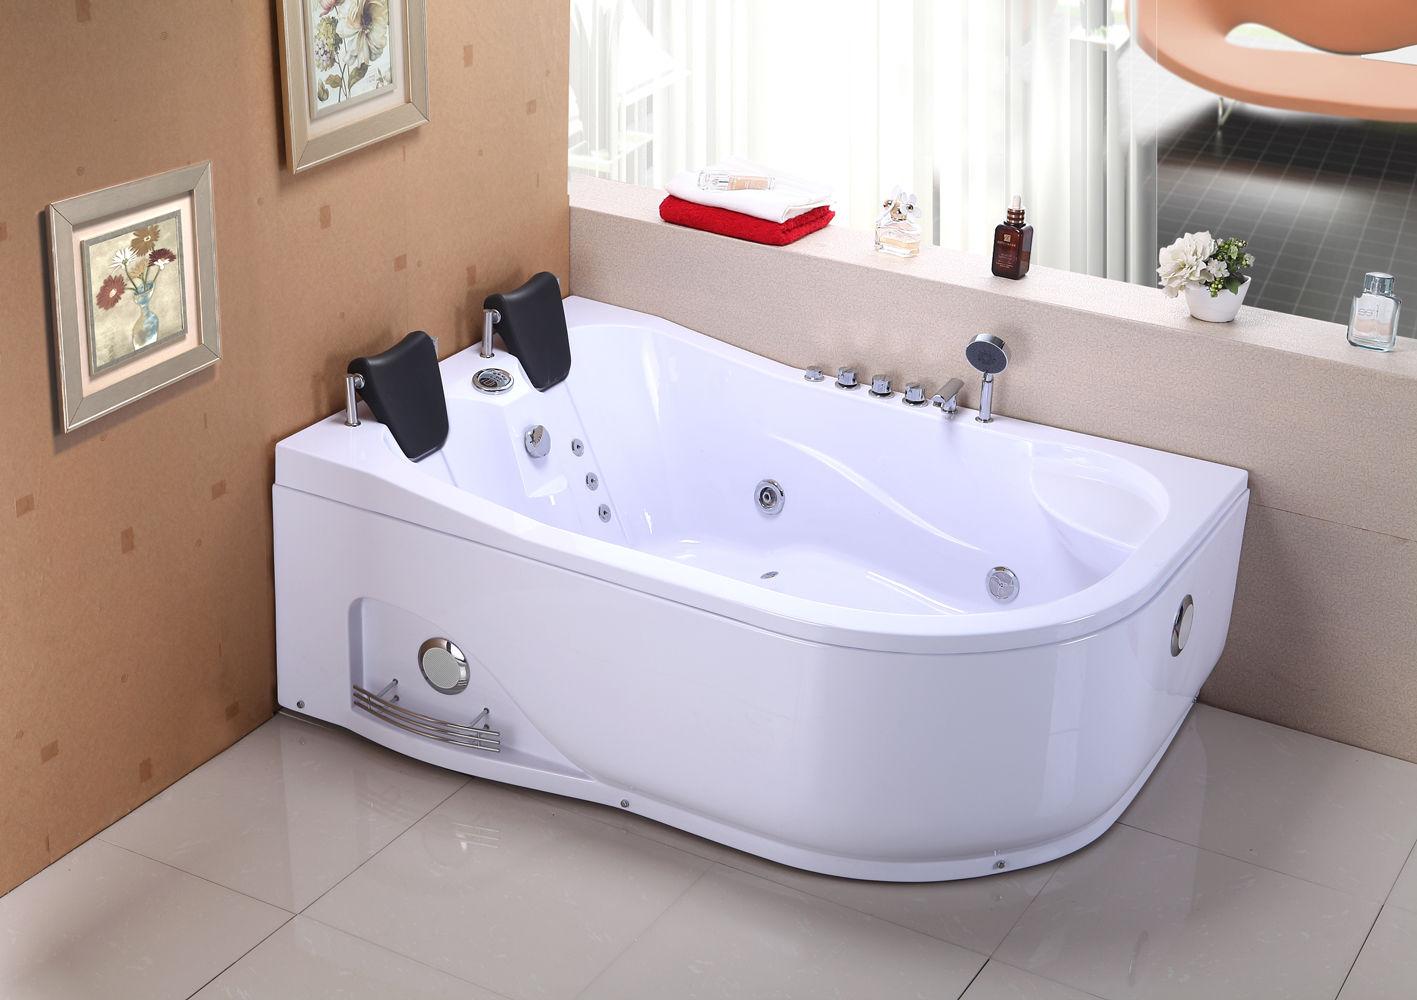 Vasca Da Bagno Hafro Prezzi : Togliere vasca mettere doccia great vasche hafro geromin era plus